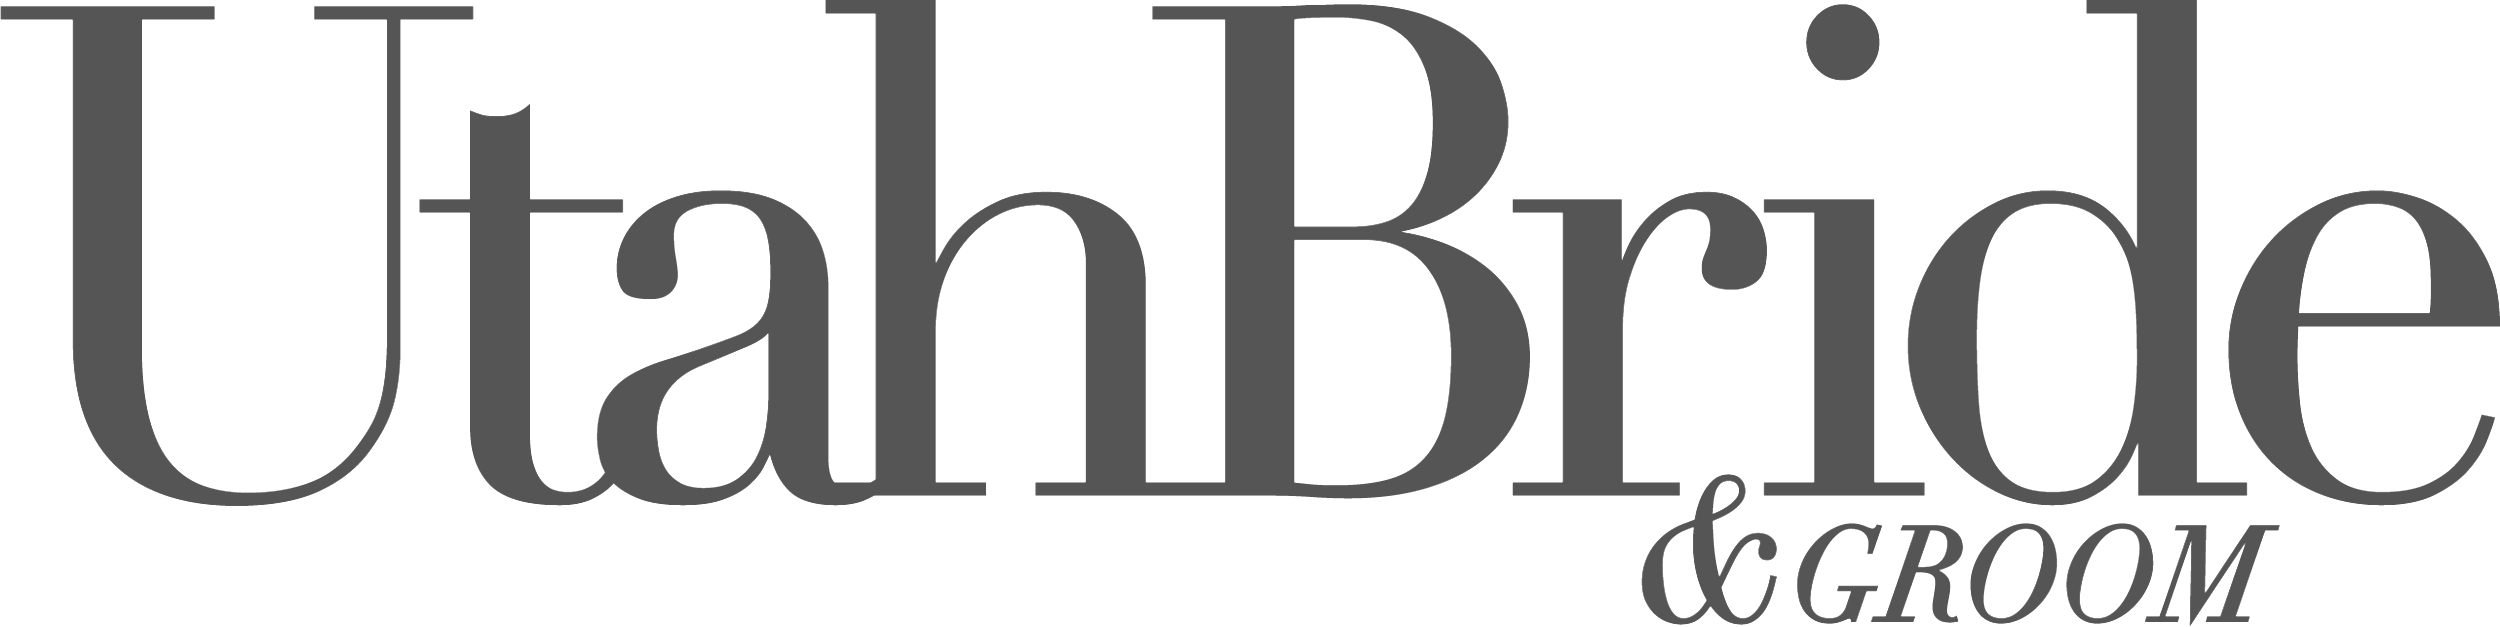 UBG-2013-Logo_Grey.png